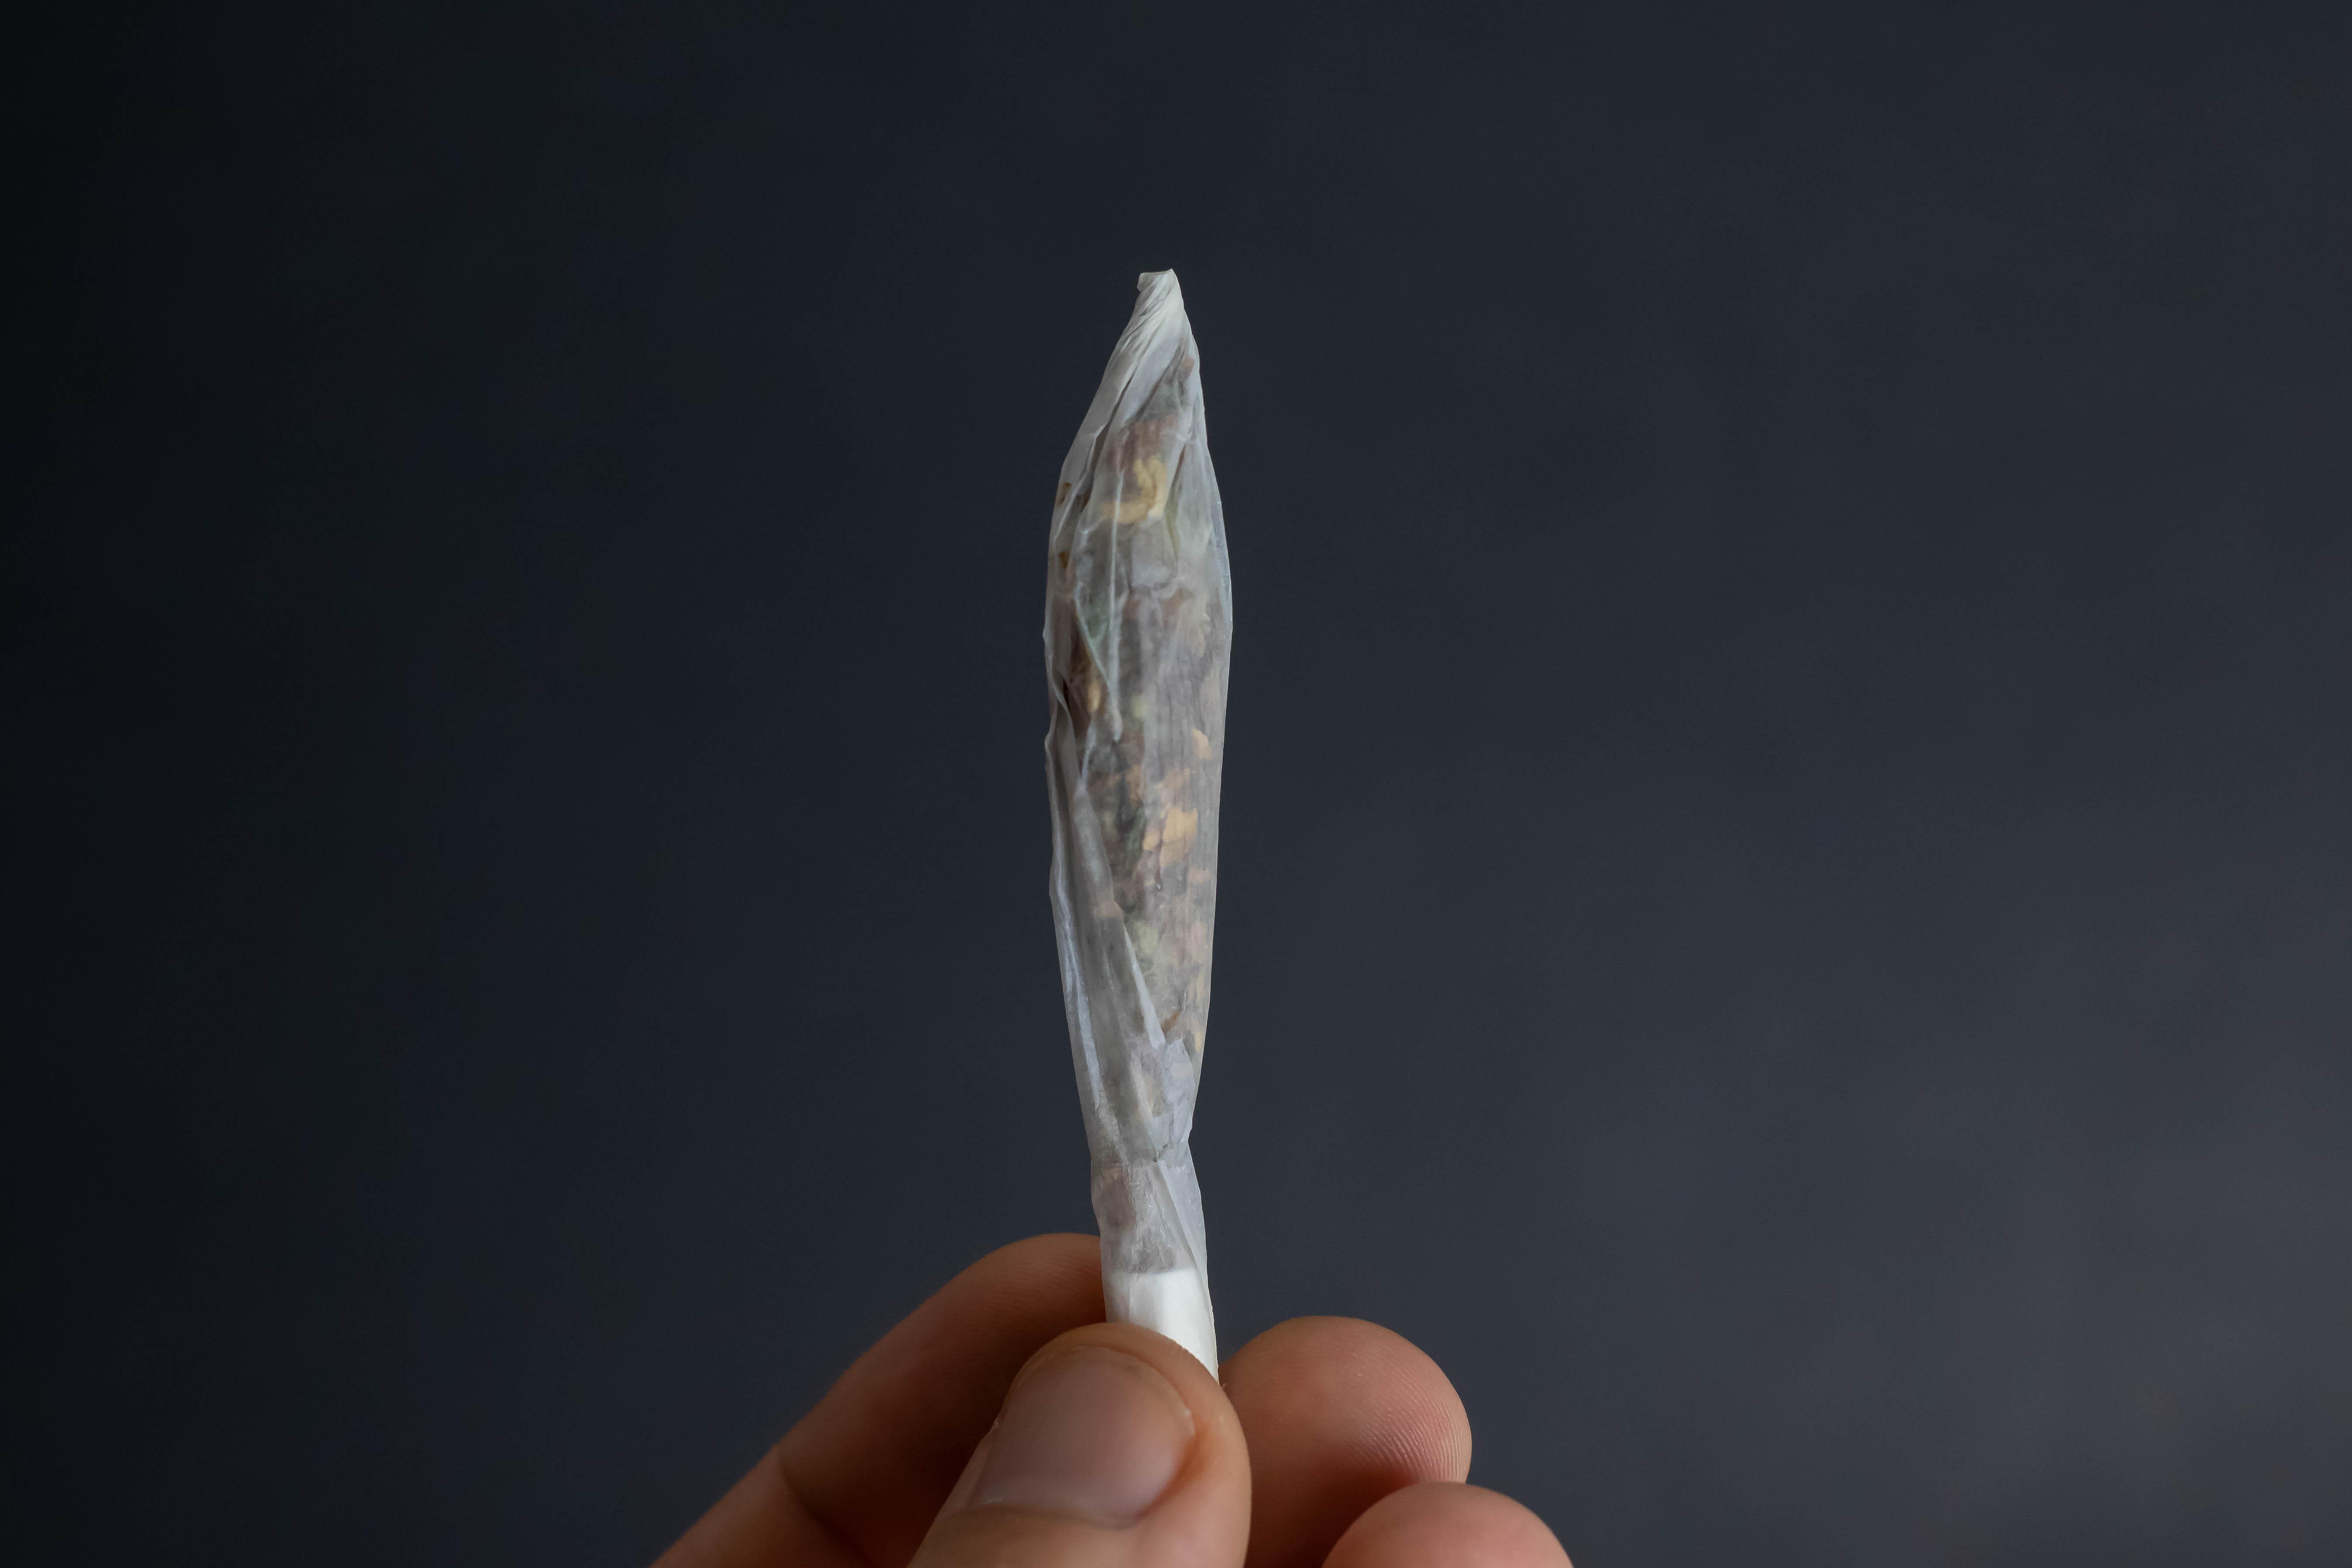 Marijuana's Unexpected Effect on Sperm Count Revealed in